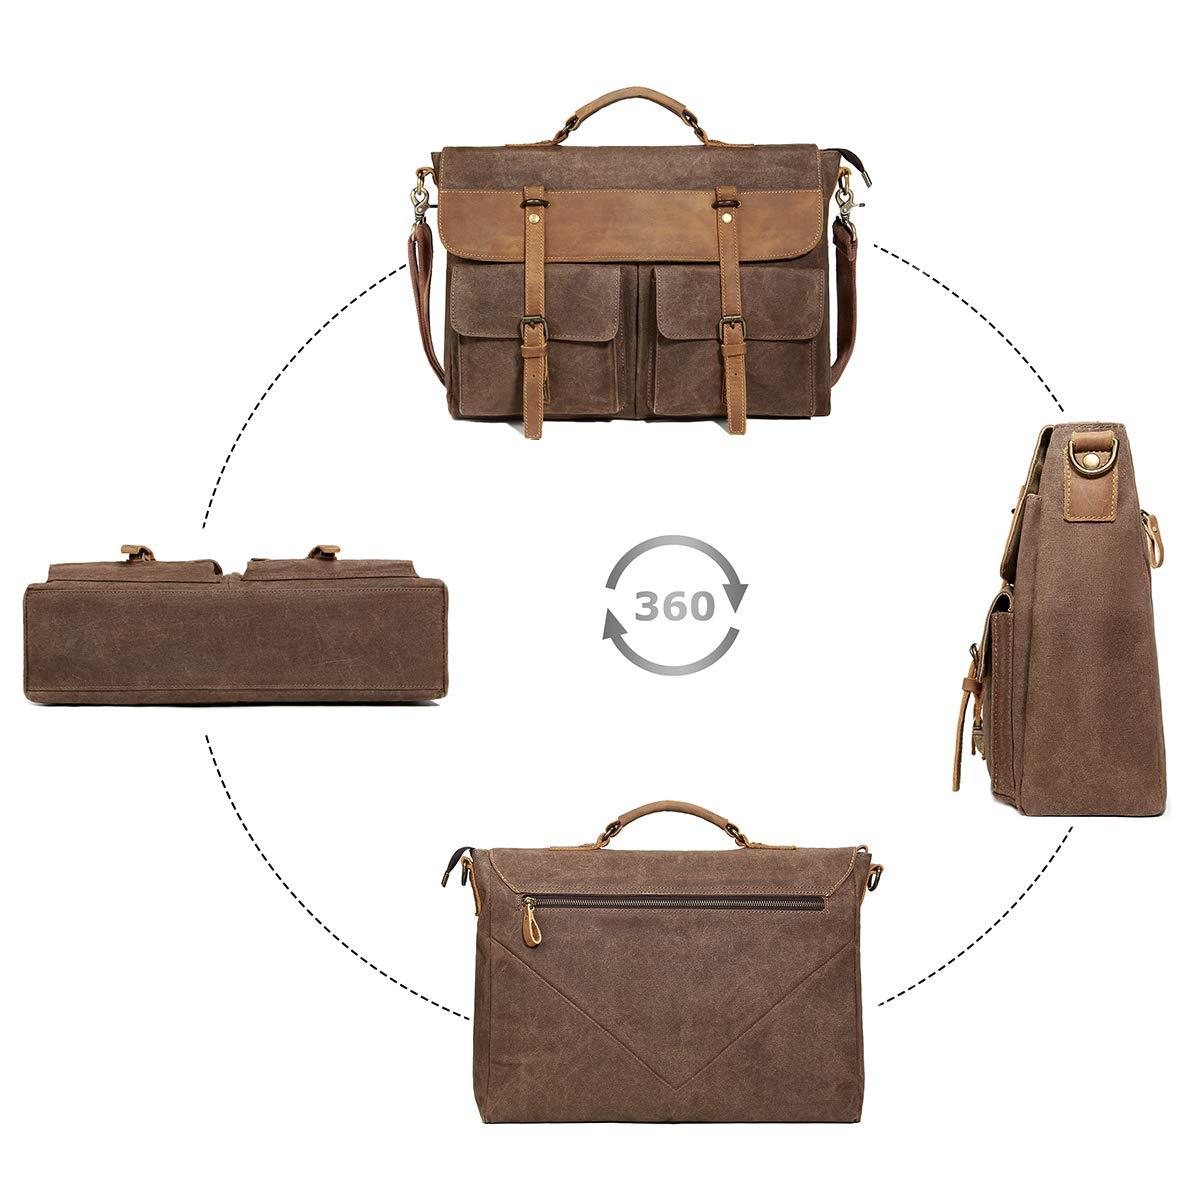 a25eaeaad2f1 Large Messenger Bag for Men Tocode